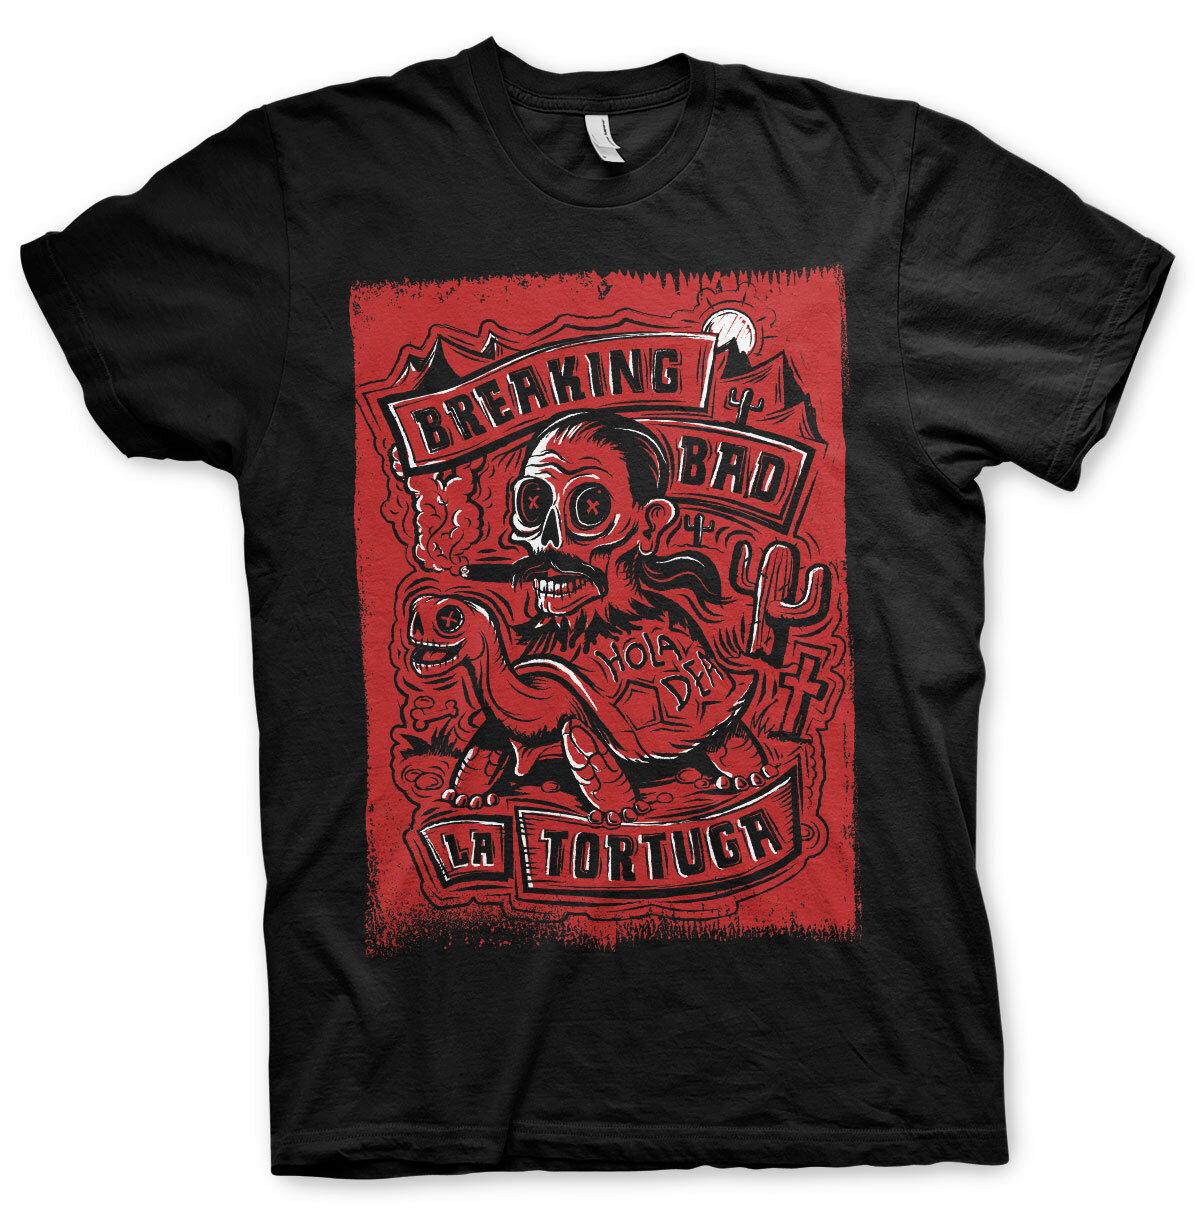 La Tortuga - Hola Death T-Shirt